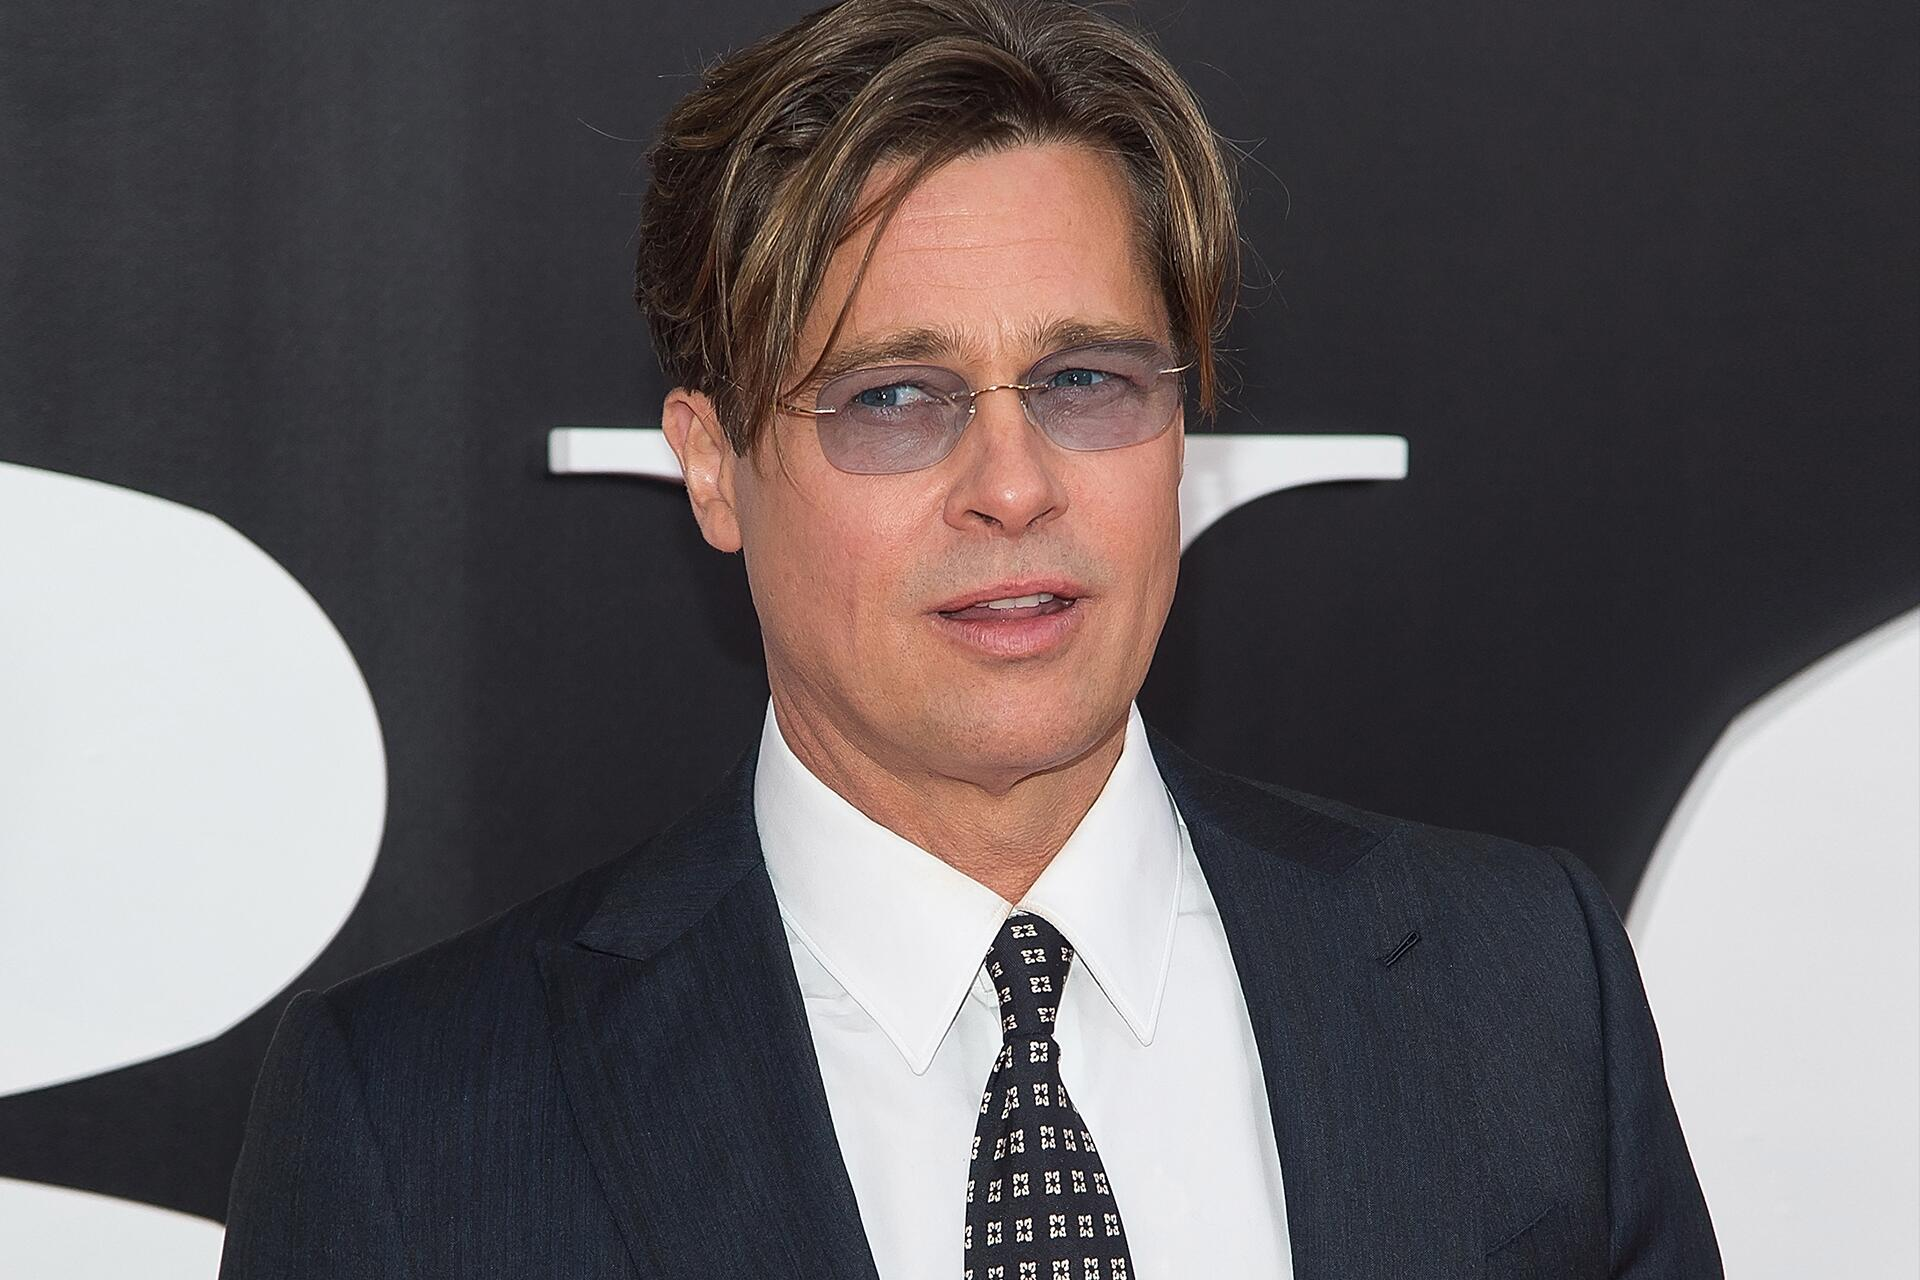 Bild zu Brad Pitt, Drogentest, Angelina Jolie, Kinder, Brangelina